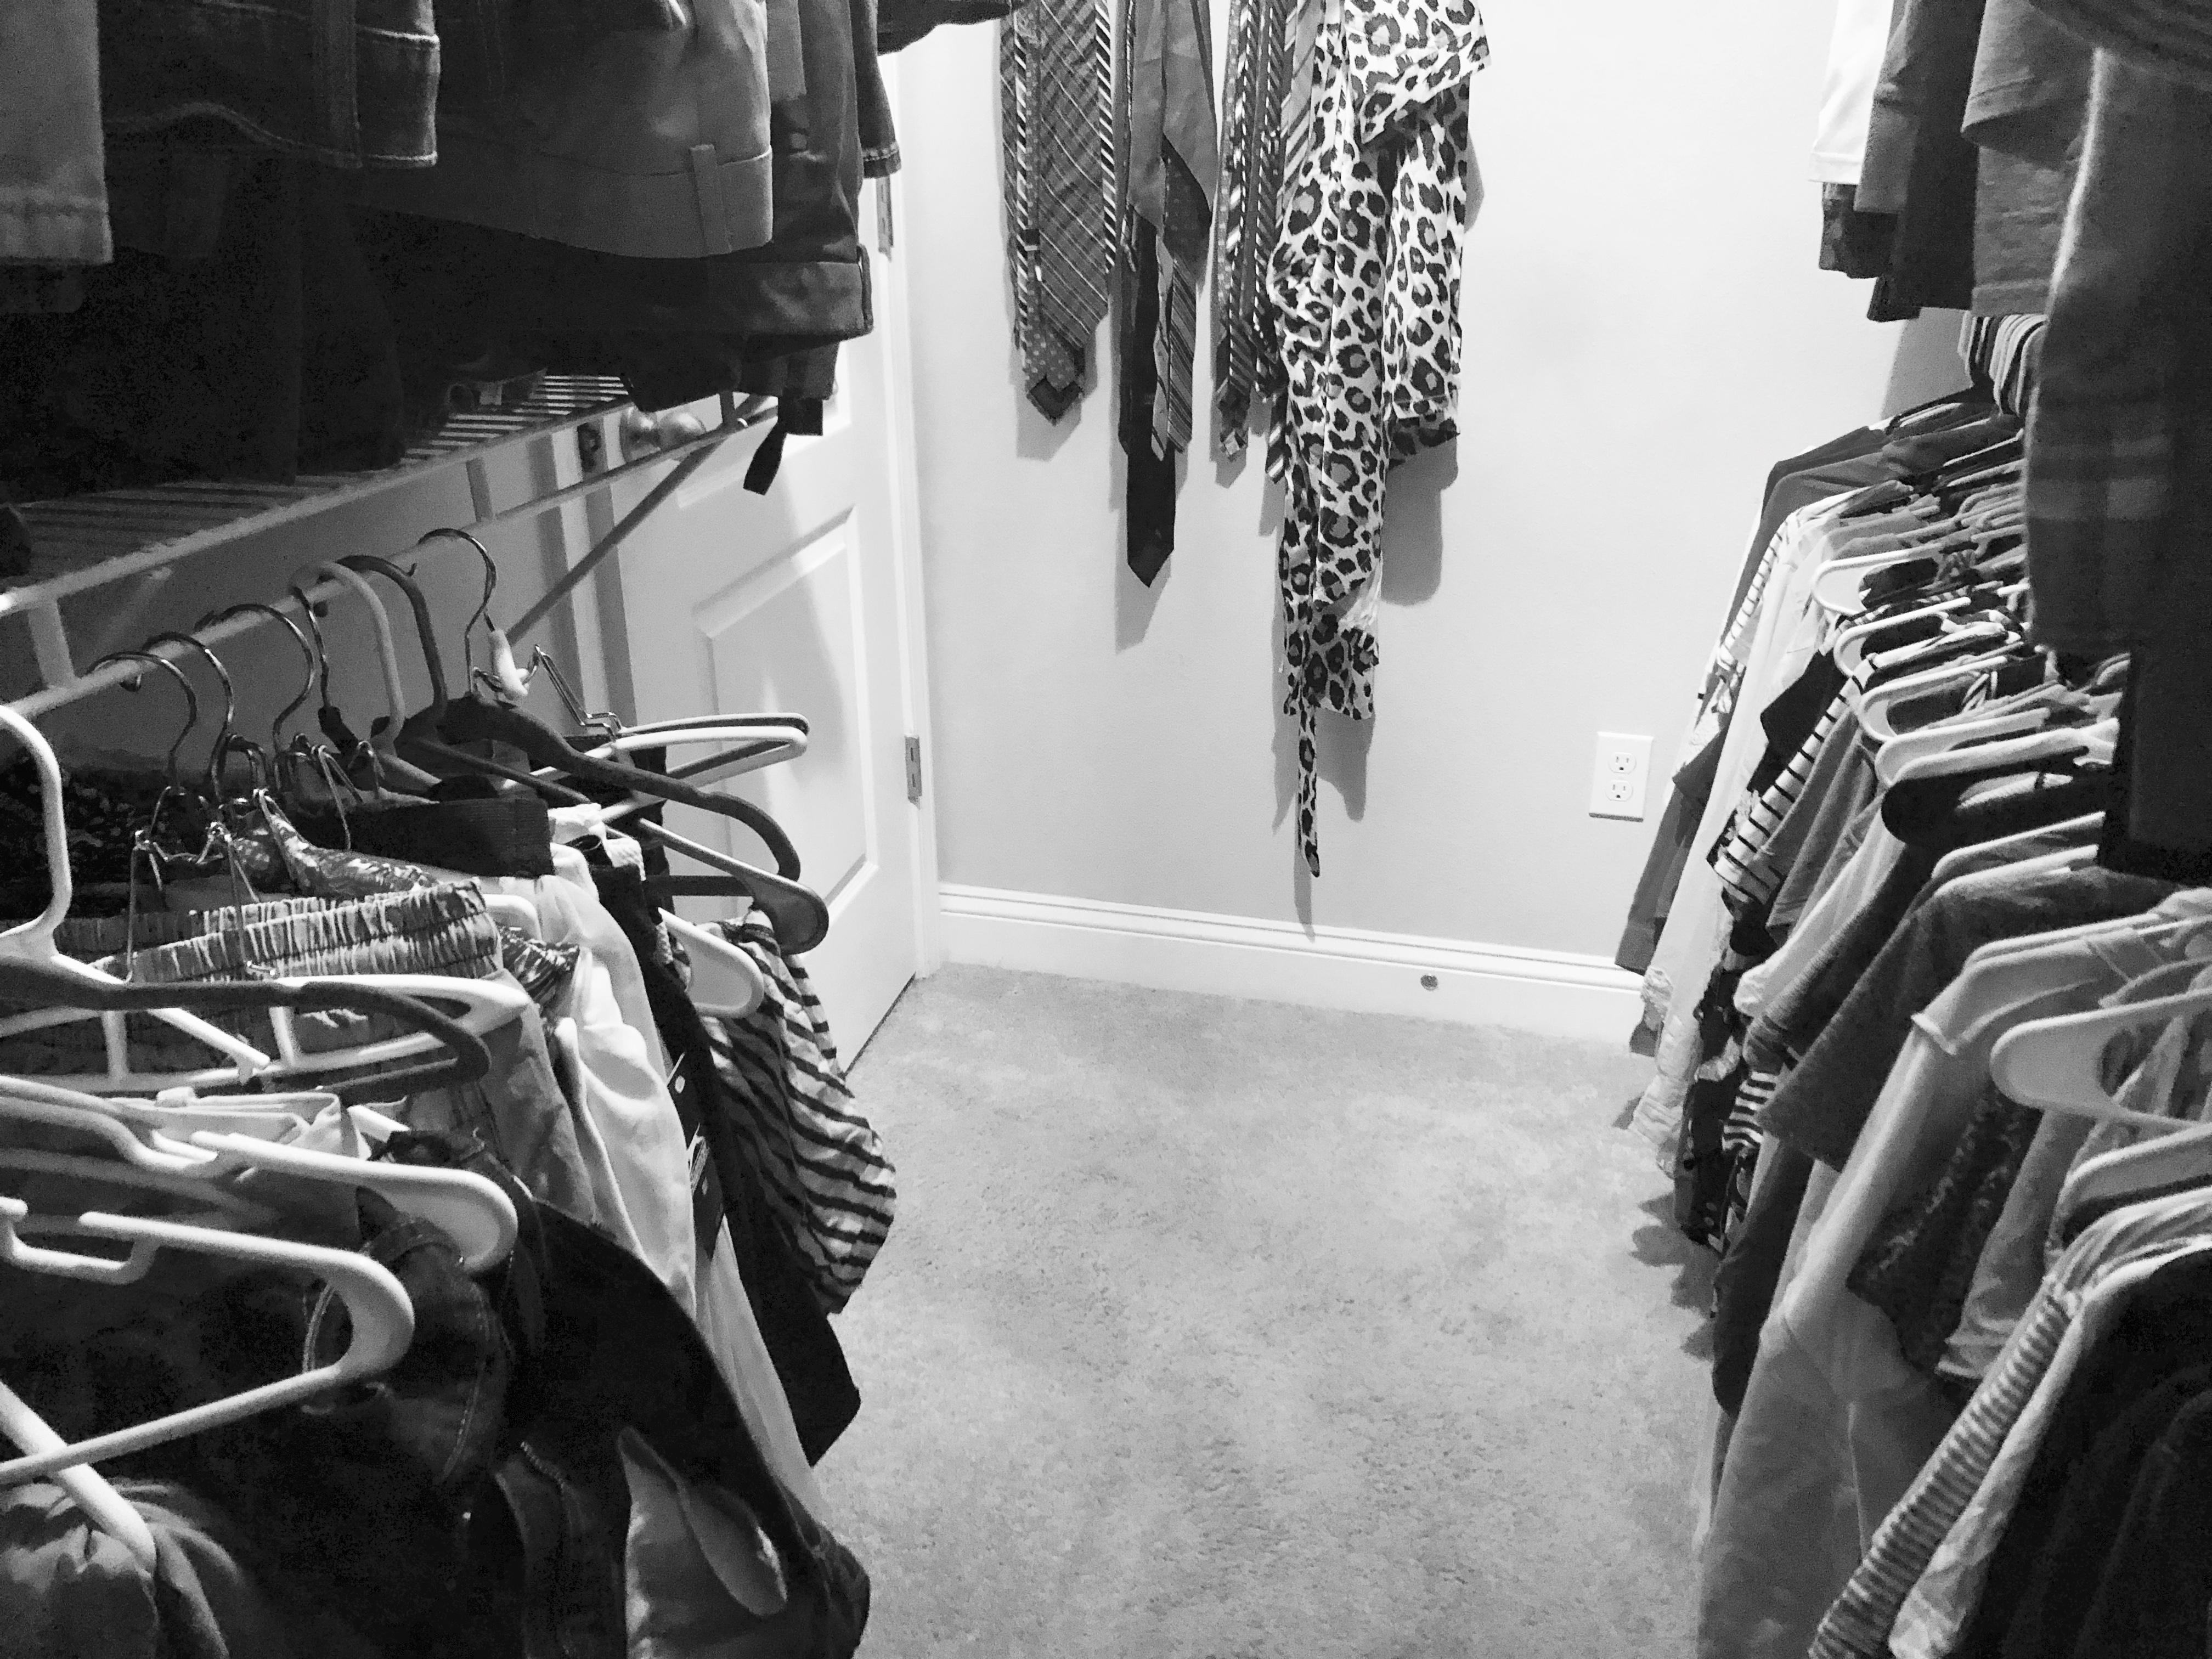 Inside of a closet, black-and-white photo